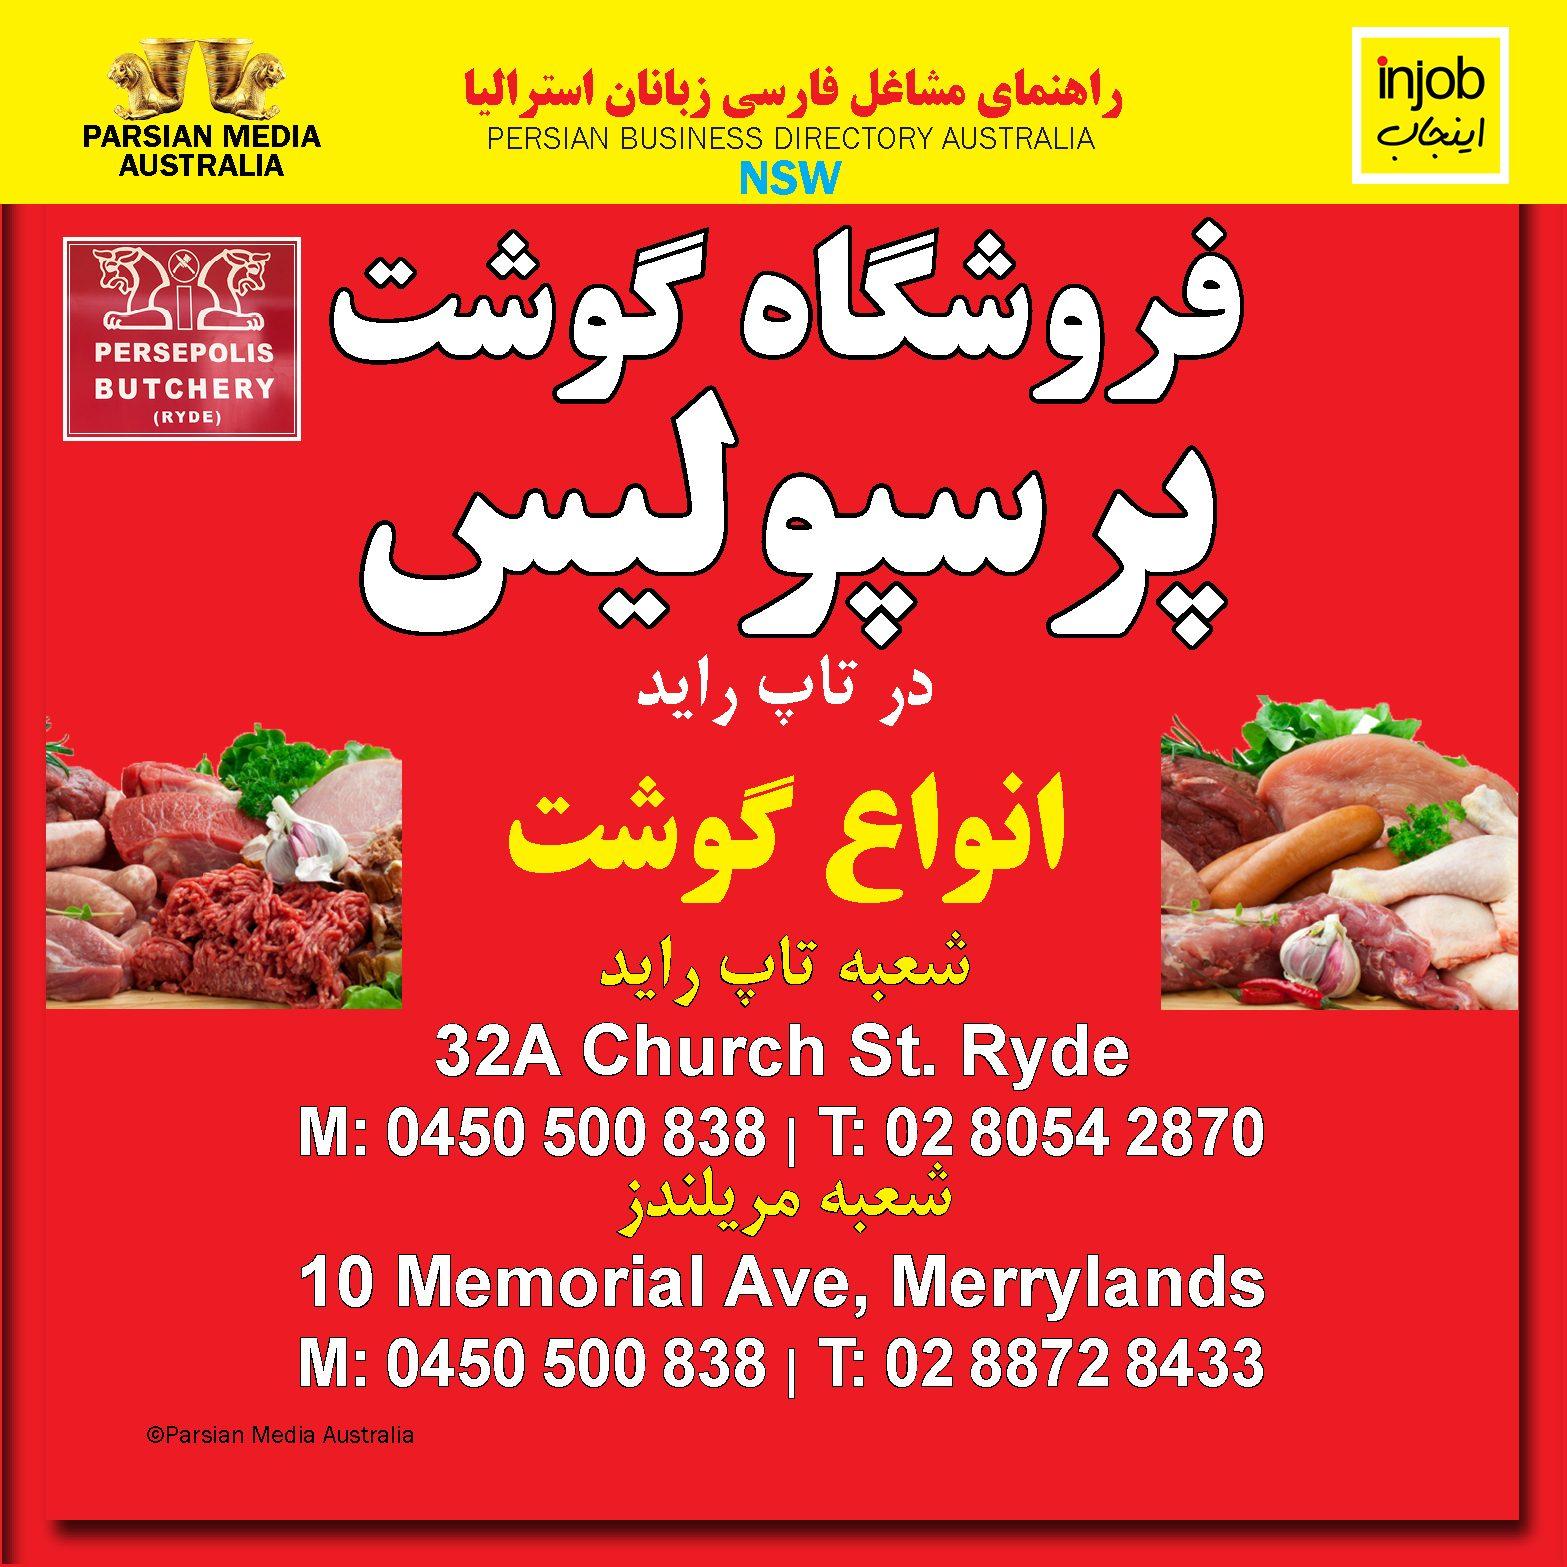 Persepolis Butchery-Butchery-Injob-2021-2022-online.jpg